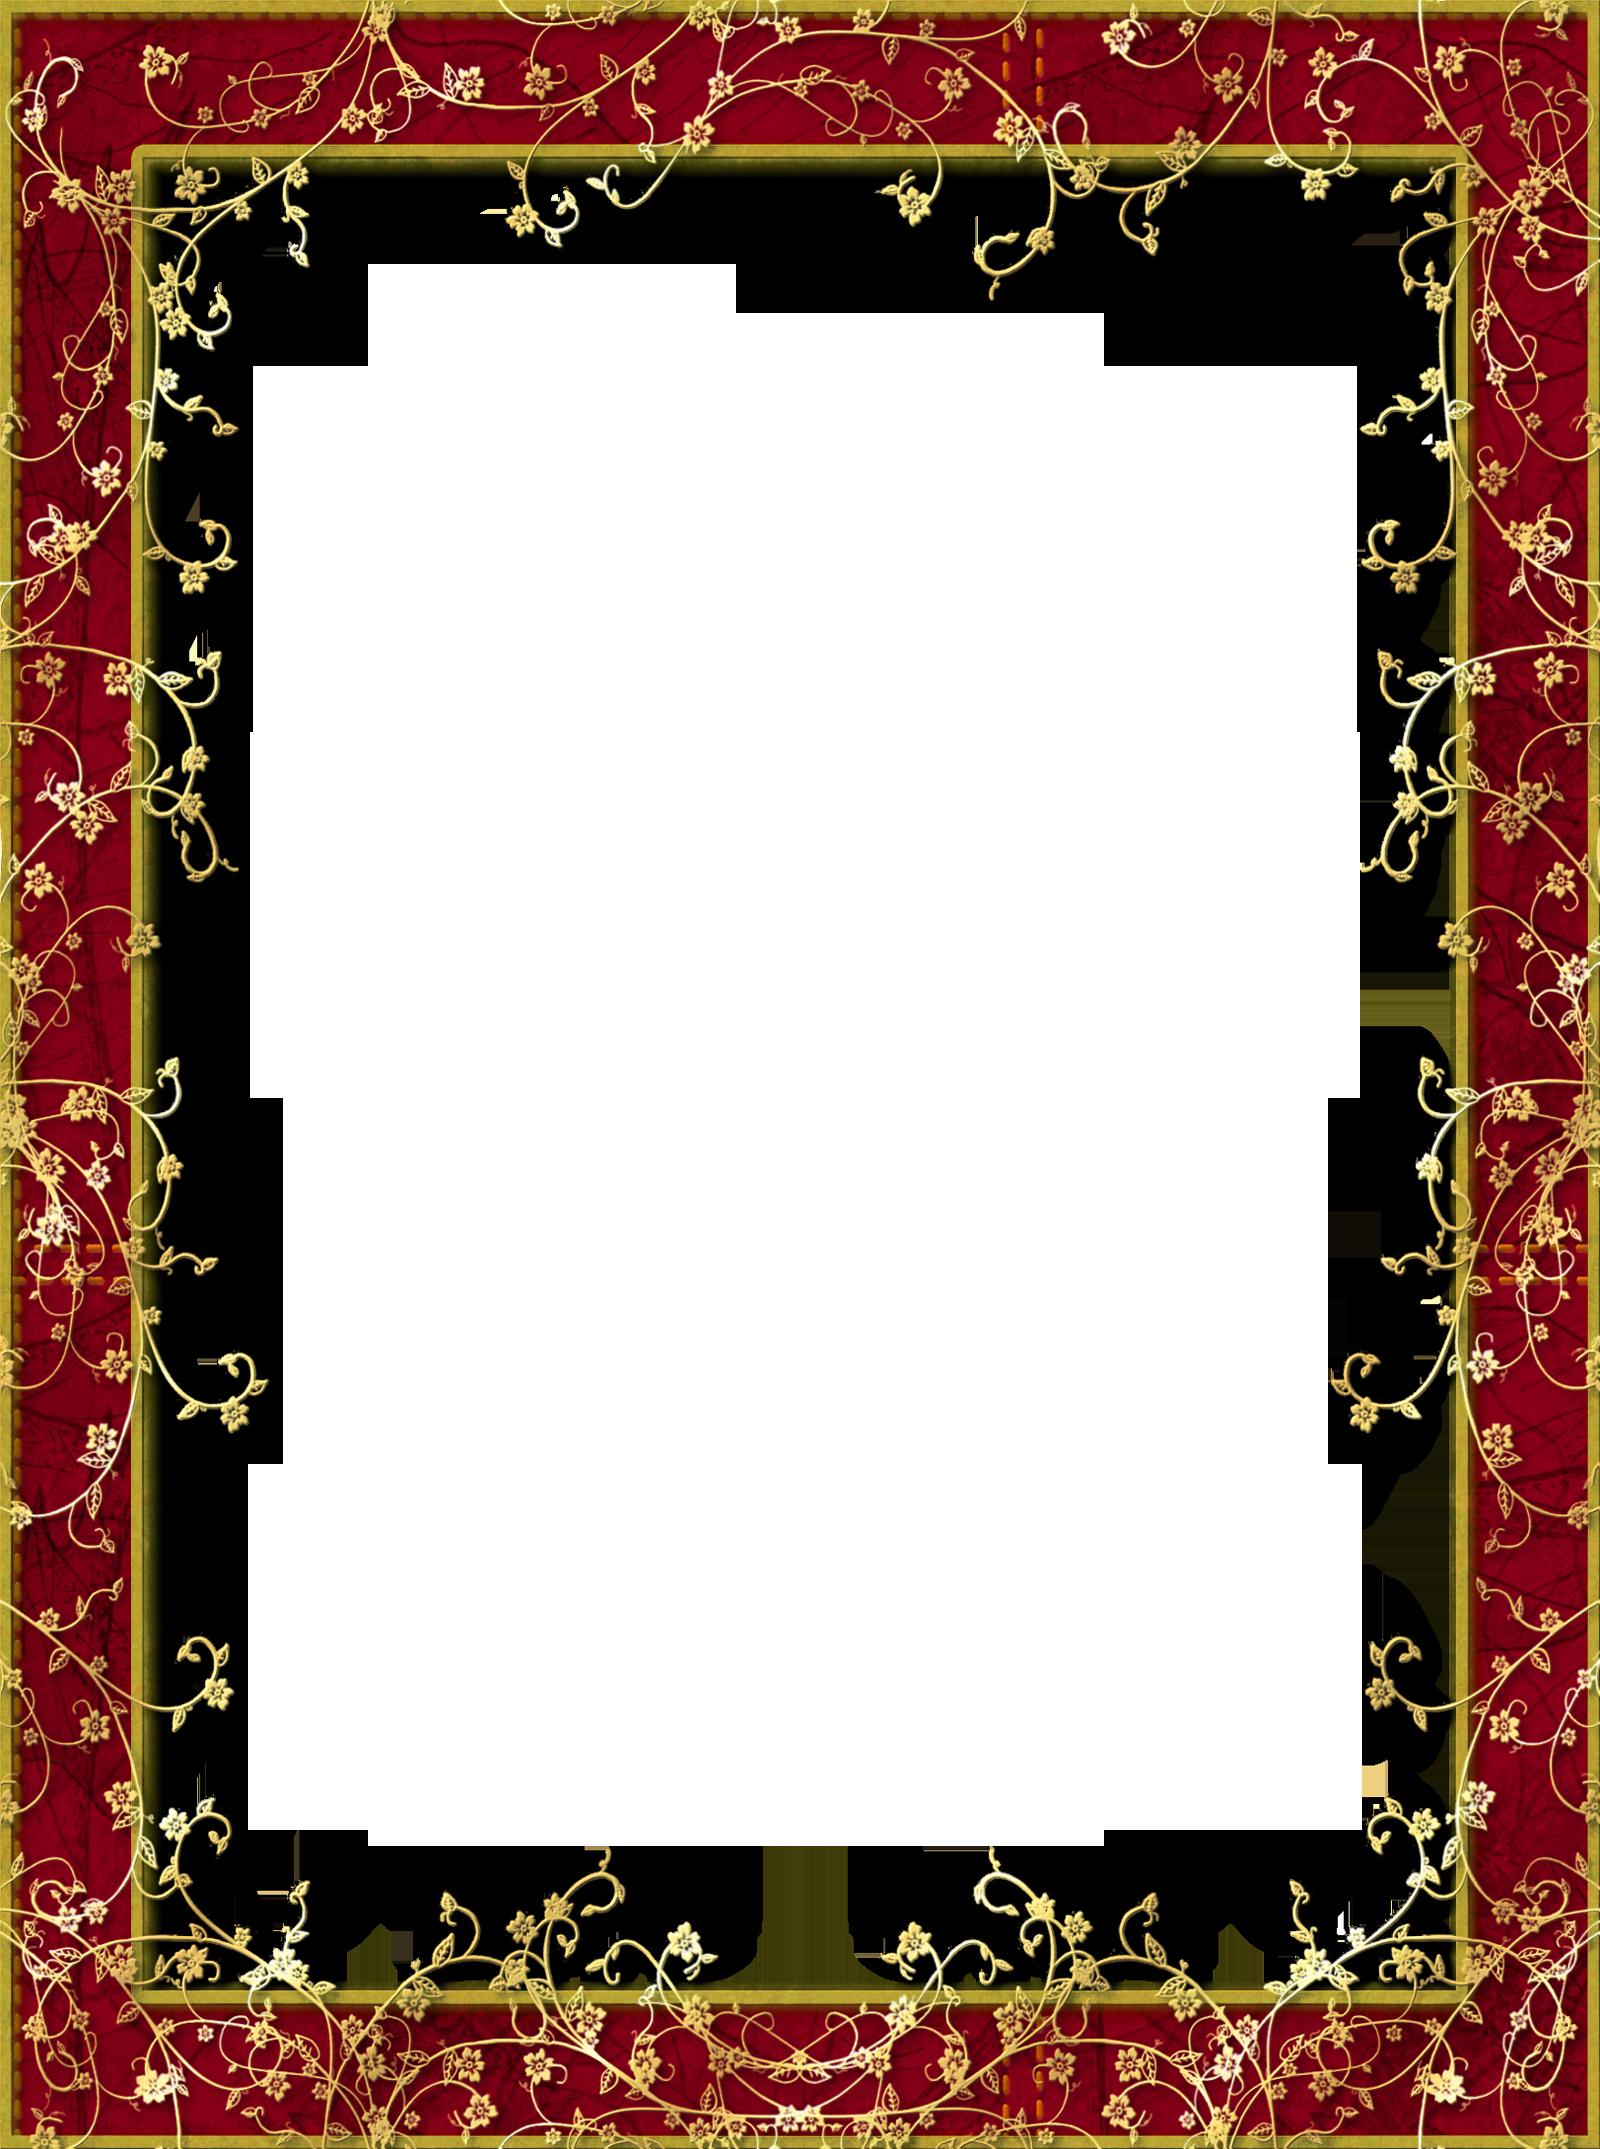 Pin by Kazım Çapacı on classic frames png | Pinterest | Flower, Gold ...